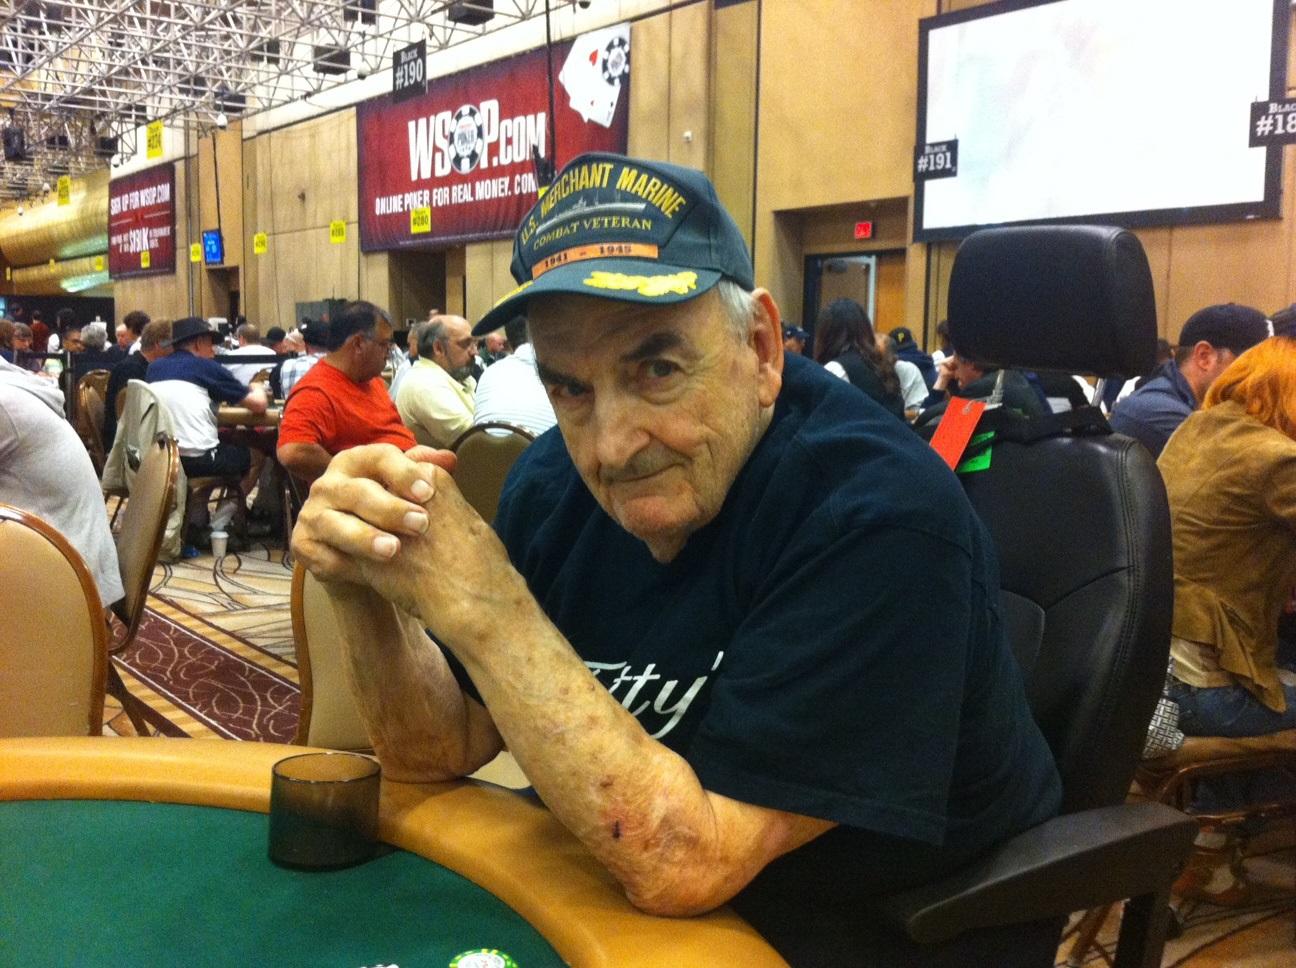 Ville spela poker tog pappas kreditkort